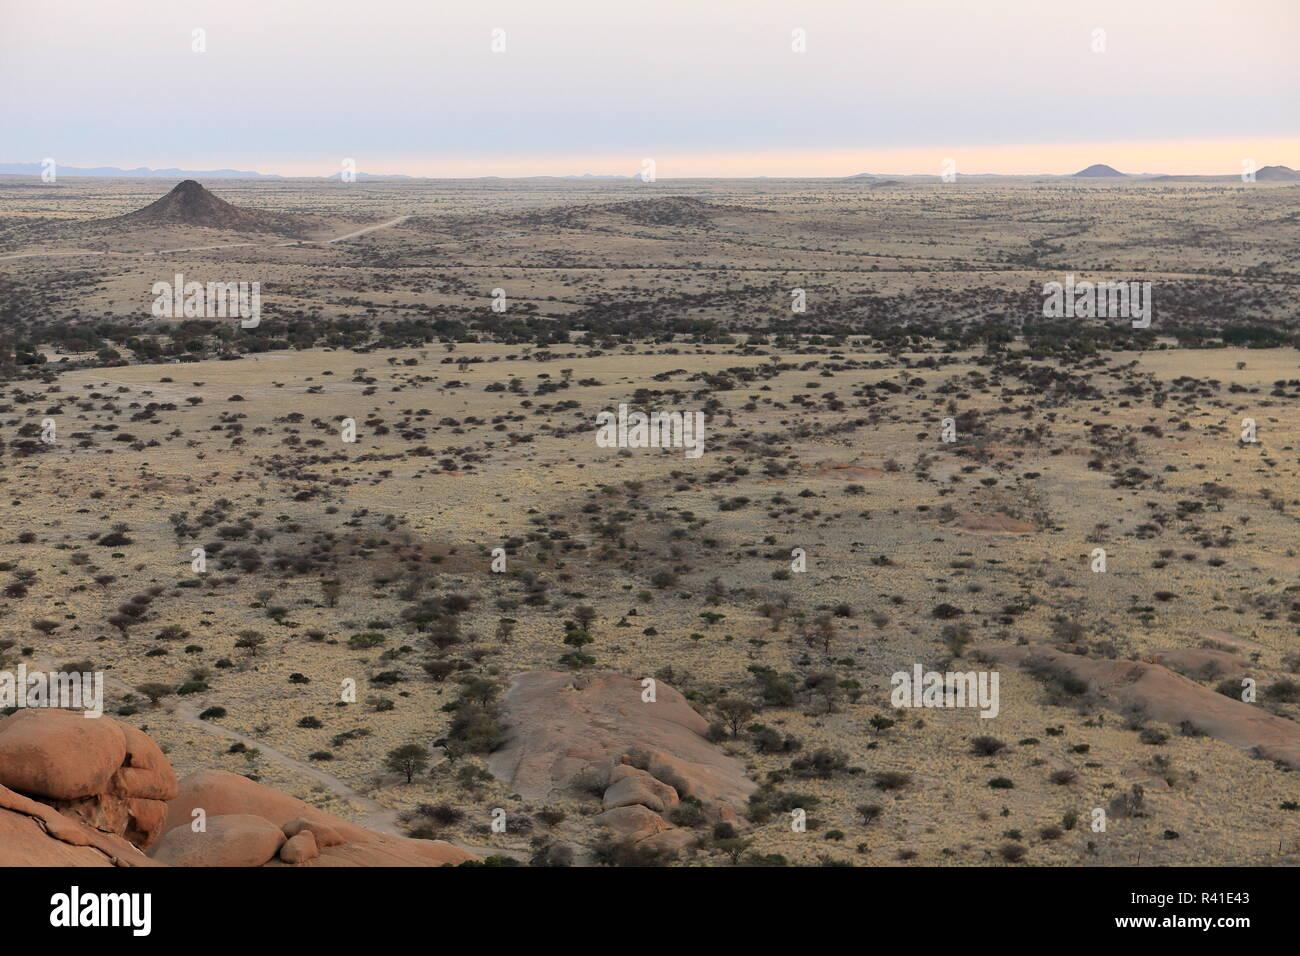 the savannah in namibia Stock Photo